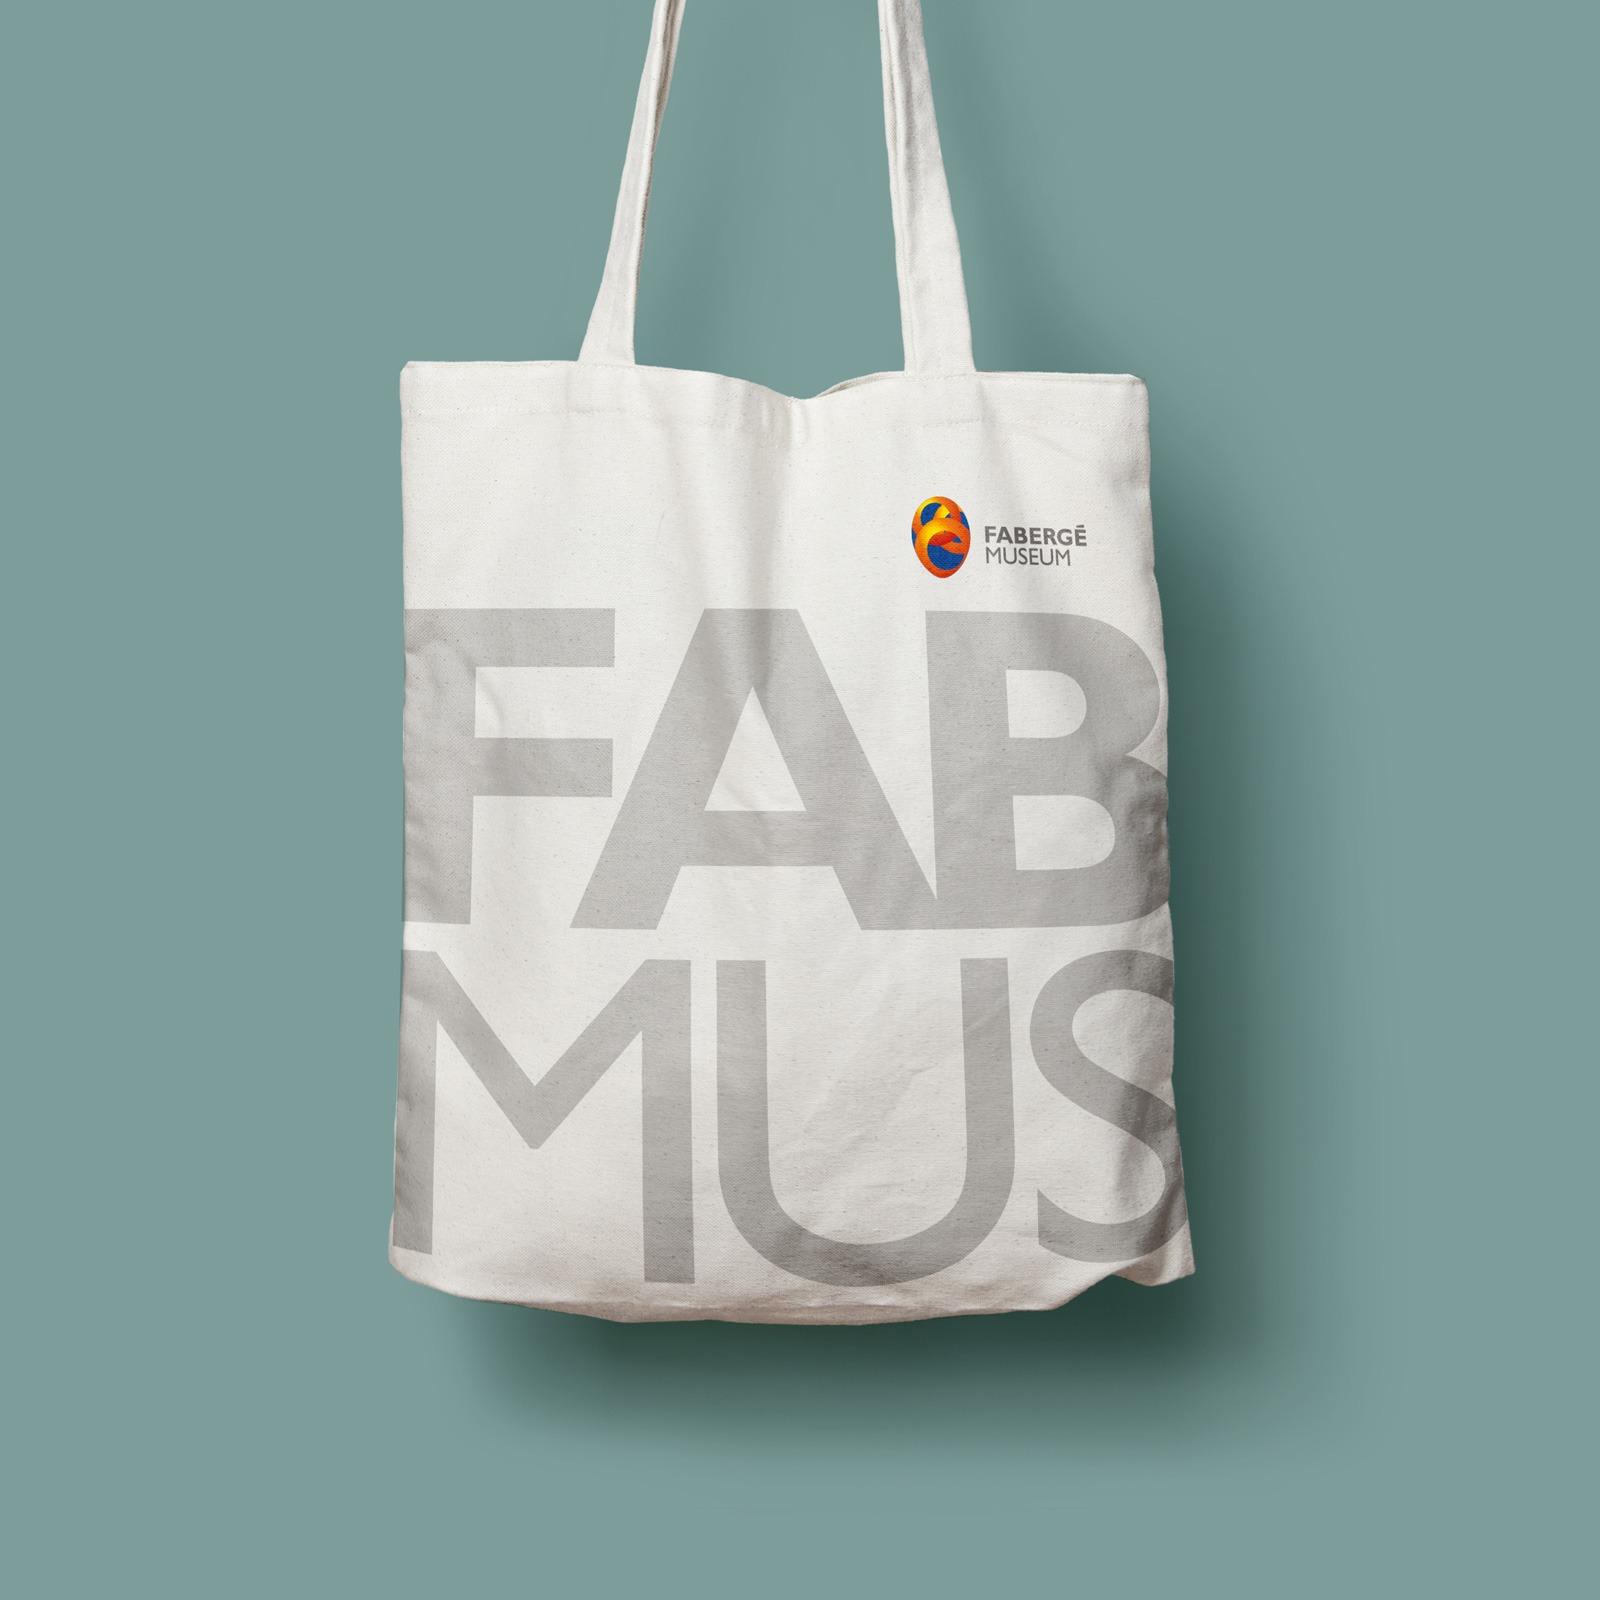 Asgard Branding, дизайн сувенирных сумок, брендинг, Музей Фаберже, tote bag